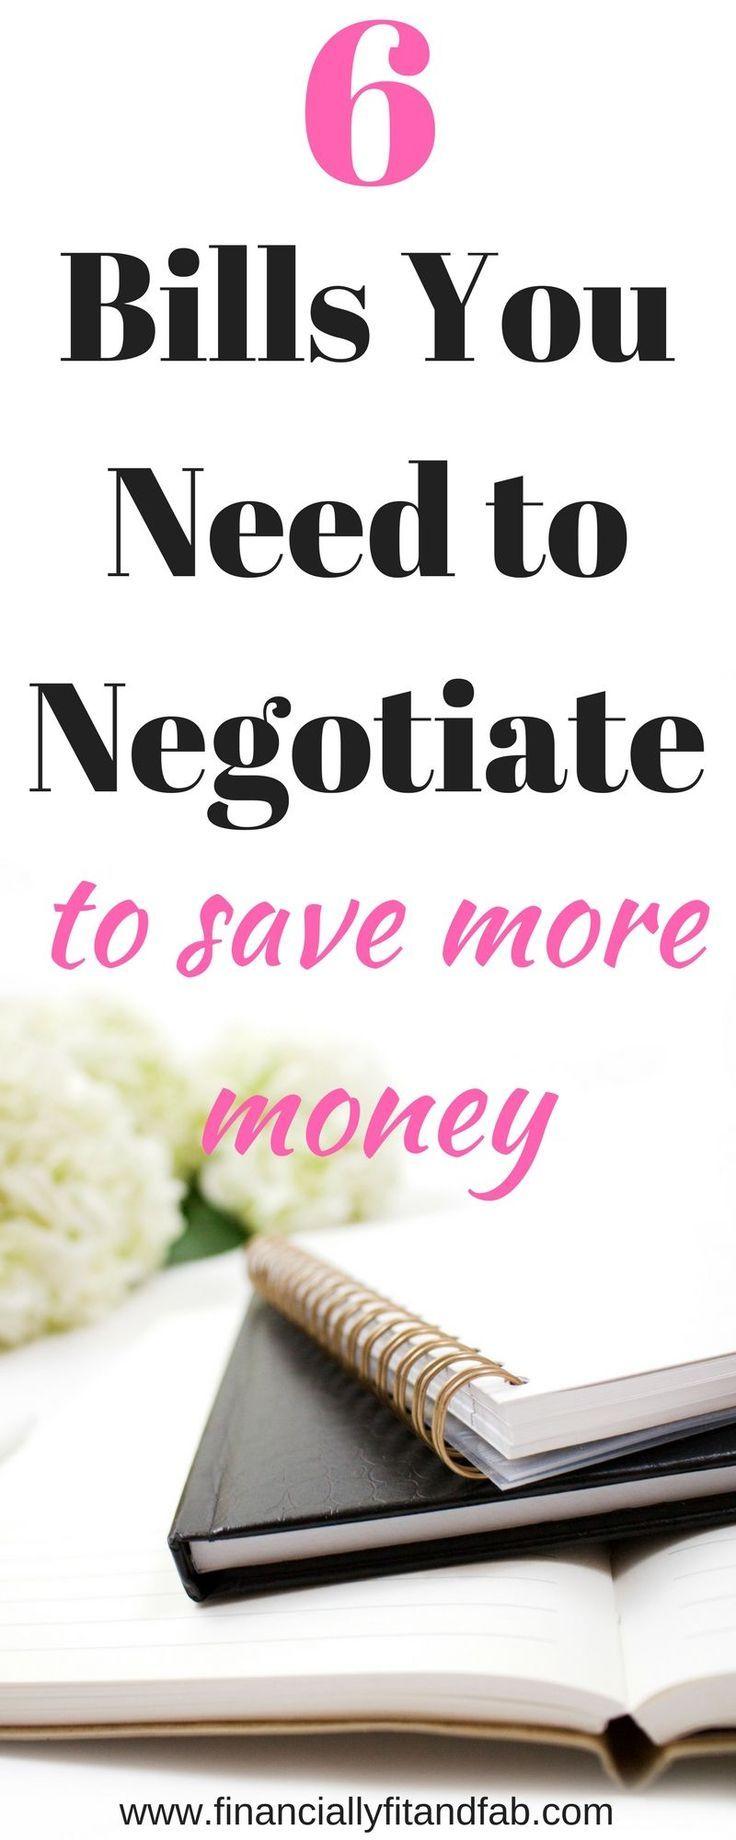 6 Bills you Need to Negotiate to Save More Money | Saving Money | Budgeting | Saving | Money Management | How to Save Money